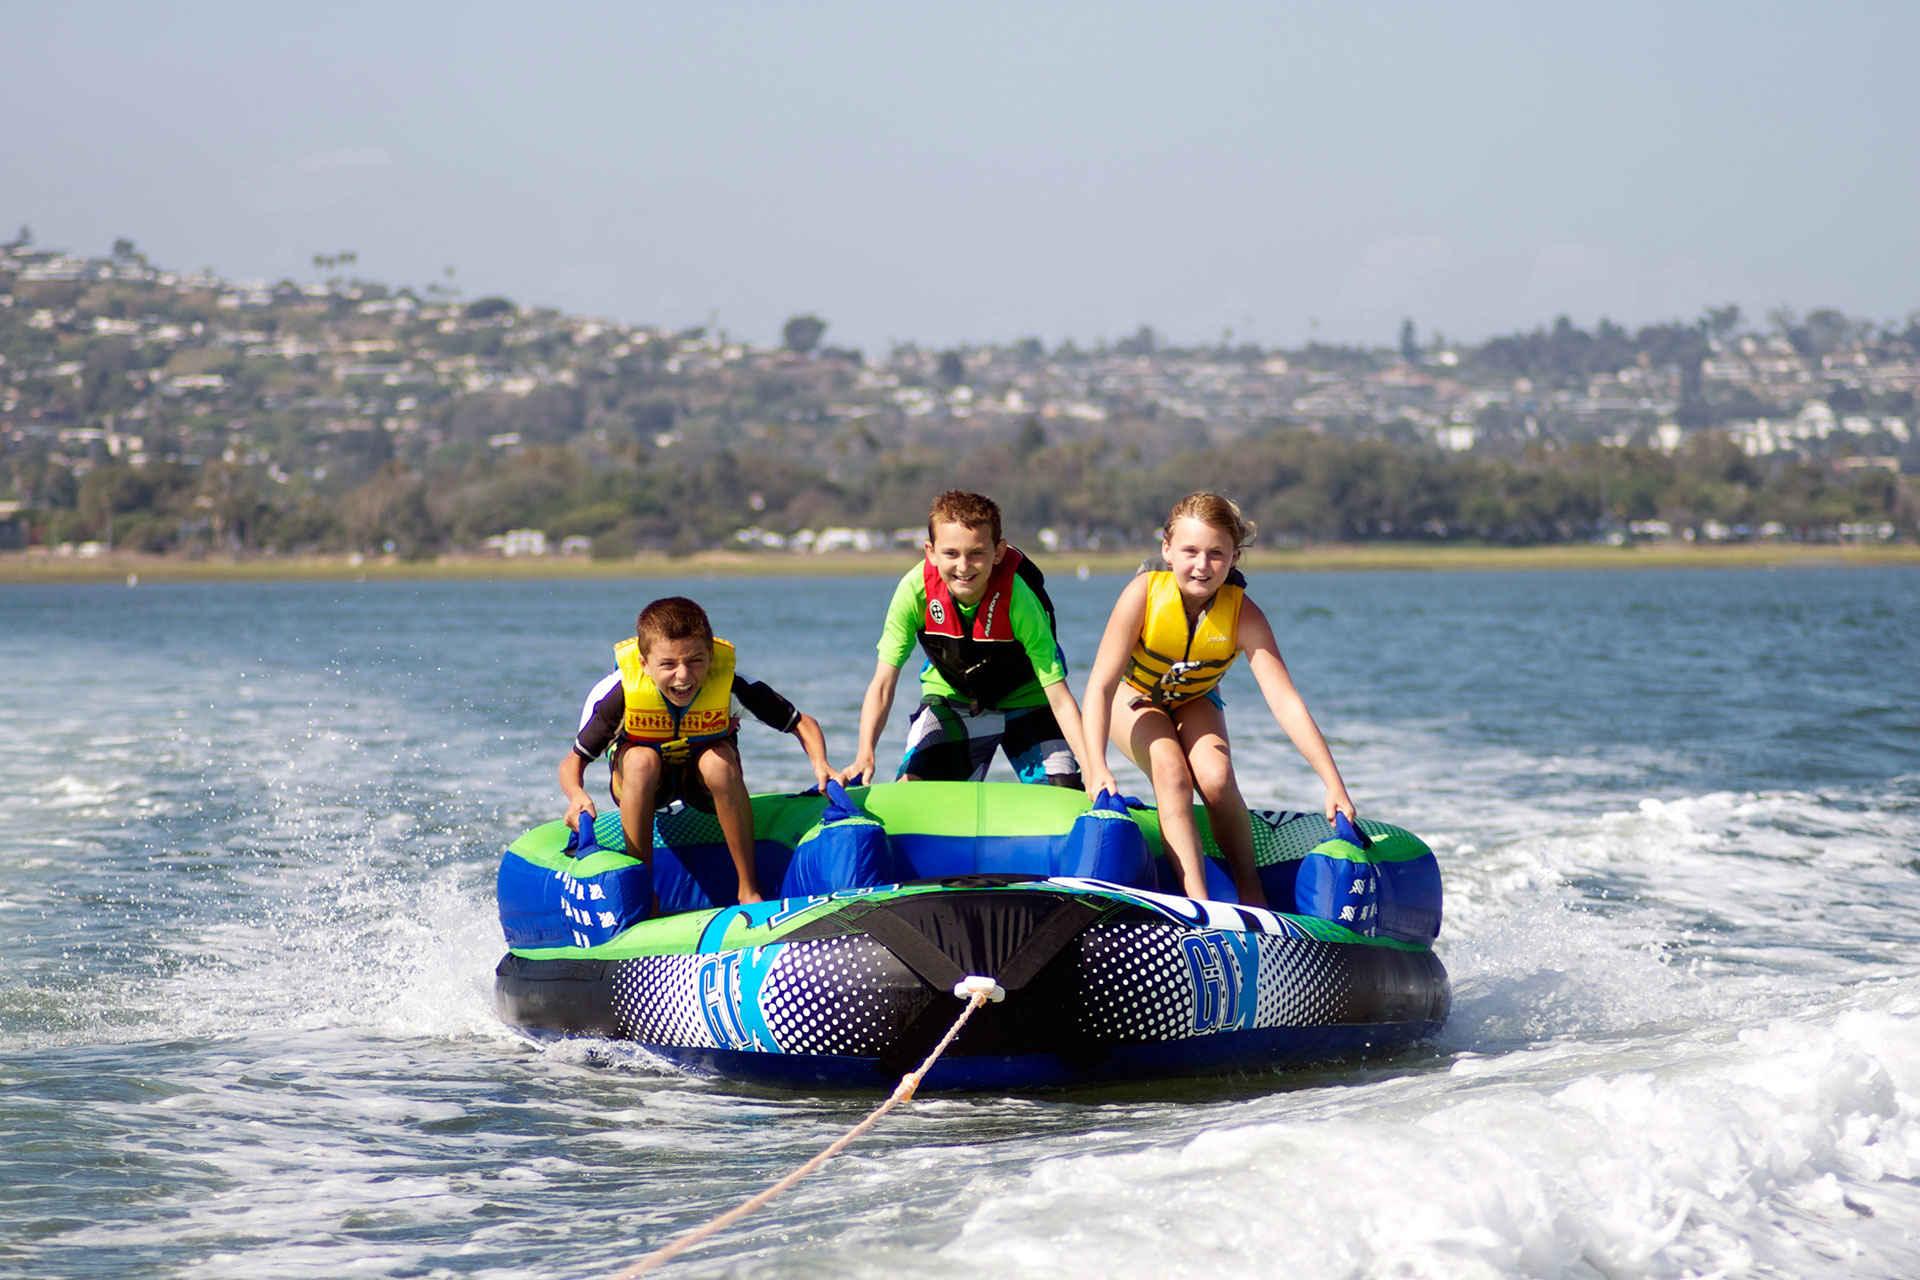 Kids Boating in San Diego, California; Courtesy of Joanne DiBona/Visit San Diego.org